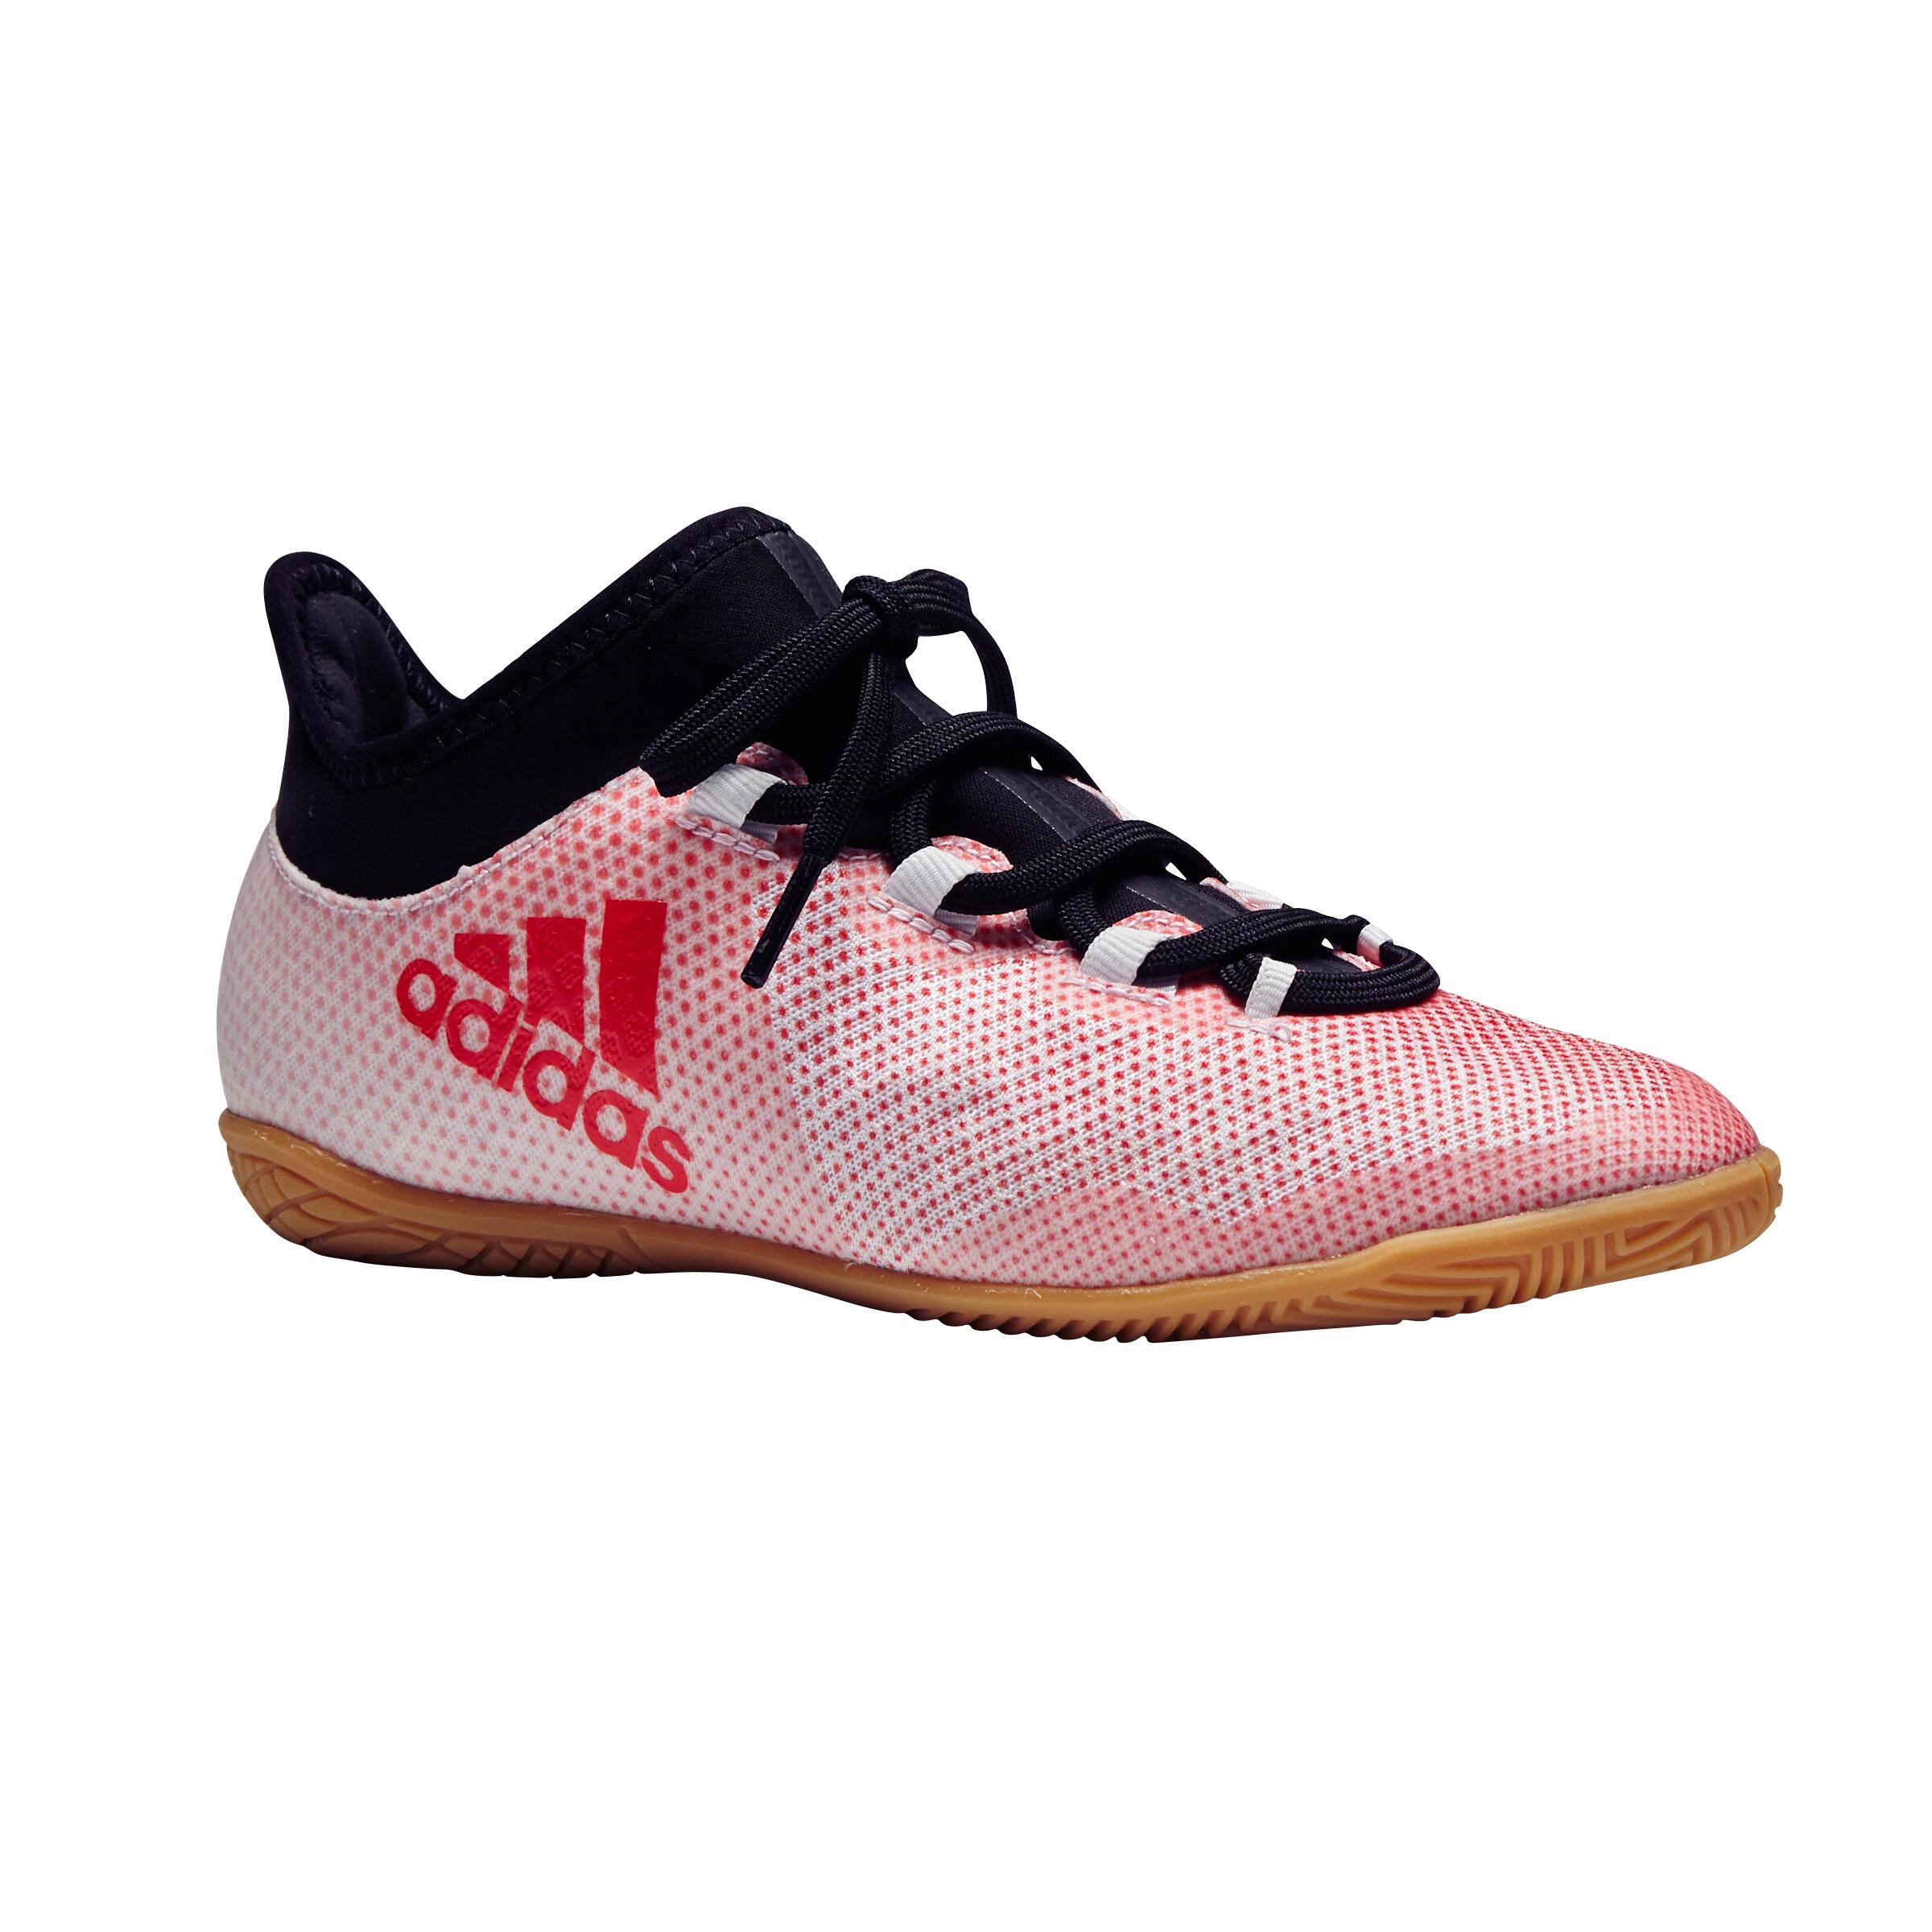 Adidas Zaalvoetbalschoenen kind X Tango 17.3 wit-rood